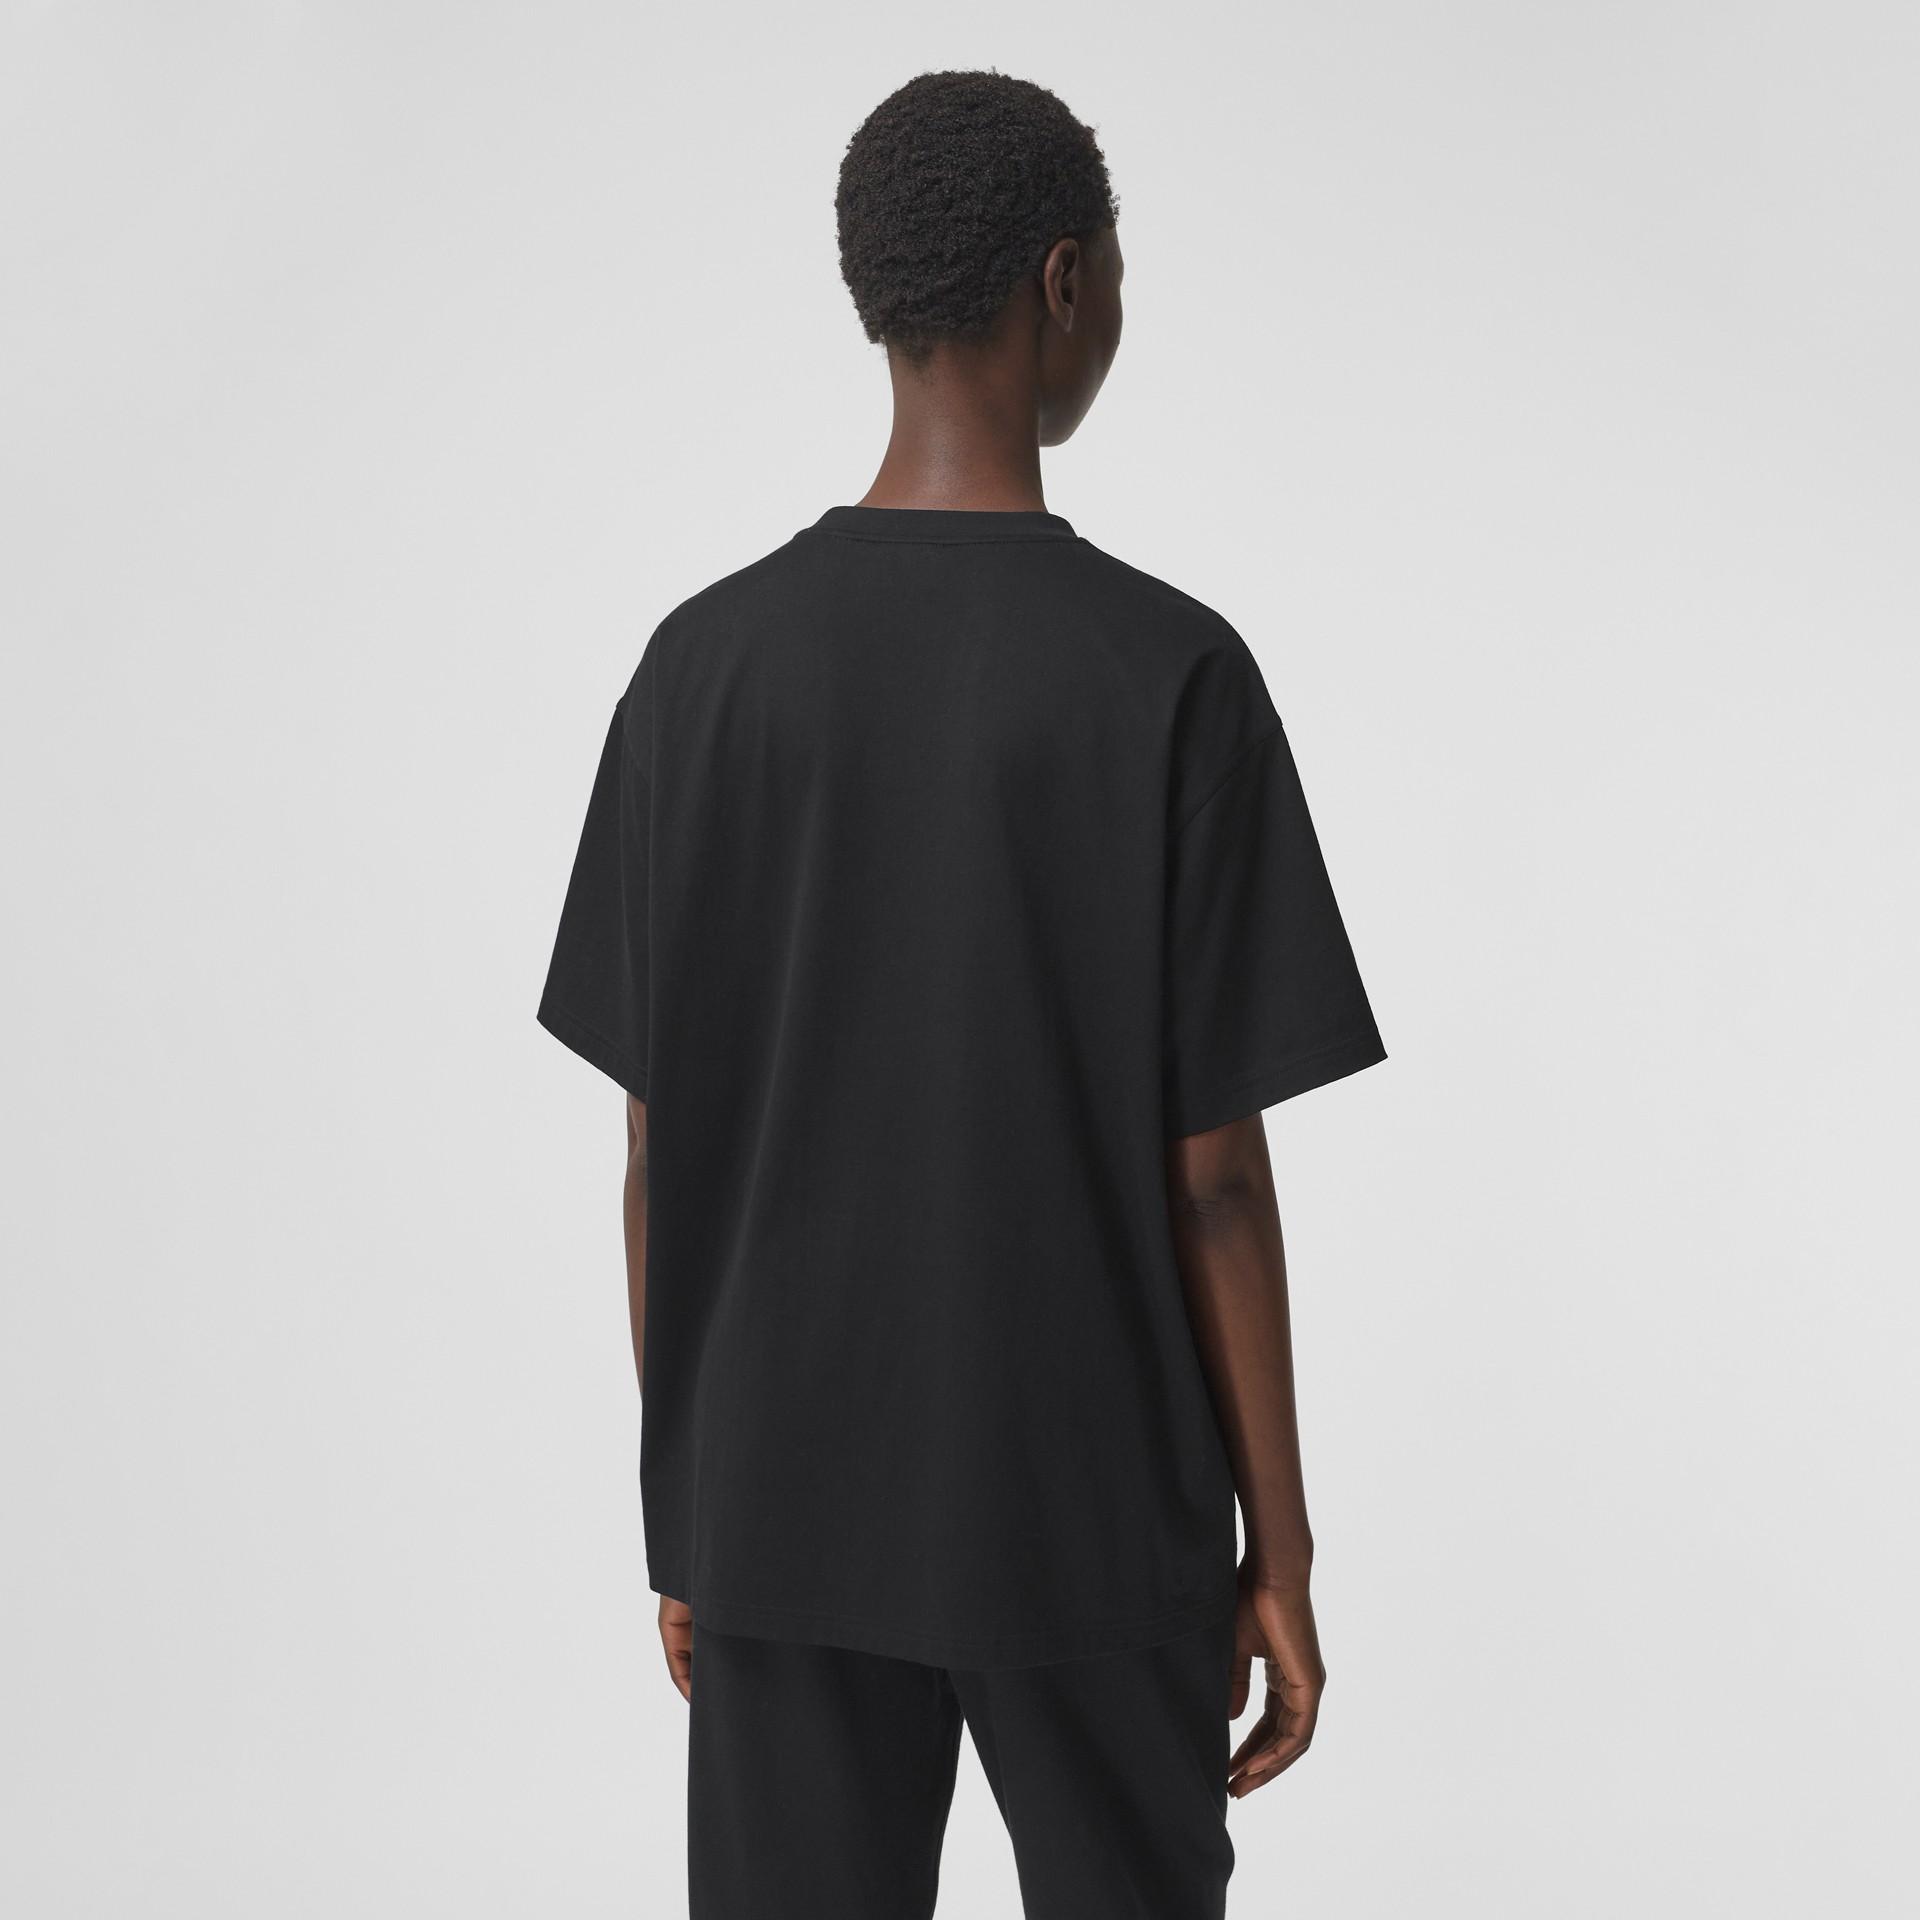 Logo Print Cotton Oversized T-shirt in Black - Women | Burberry - gallery image 2